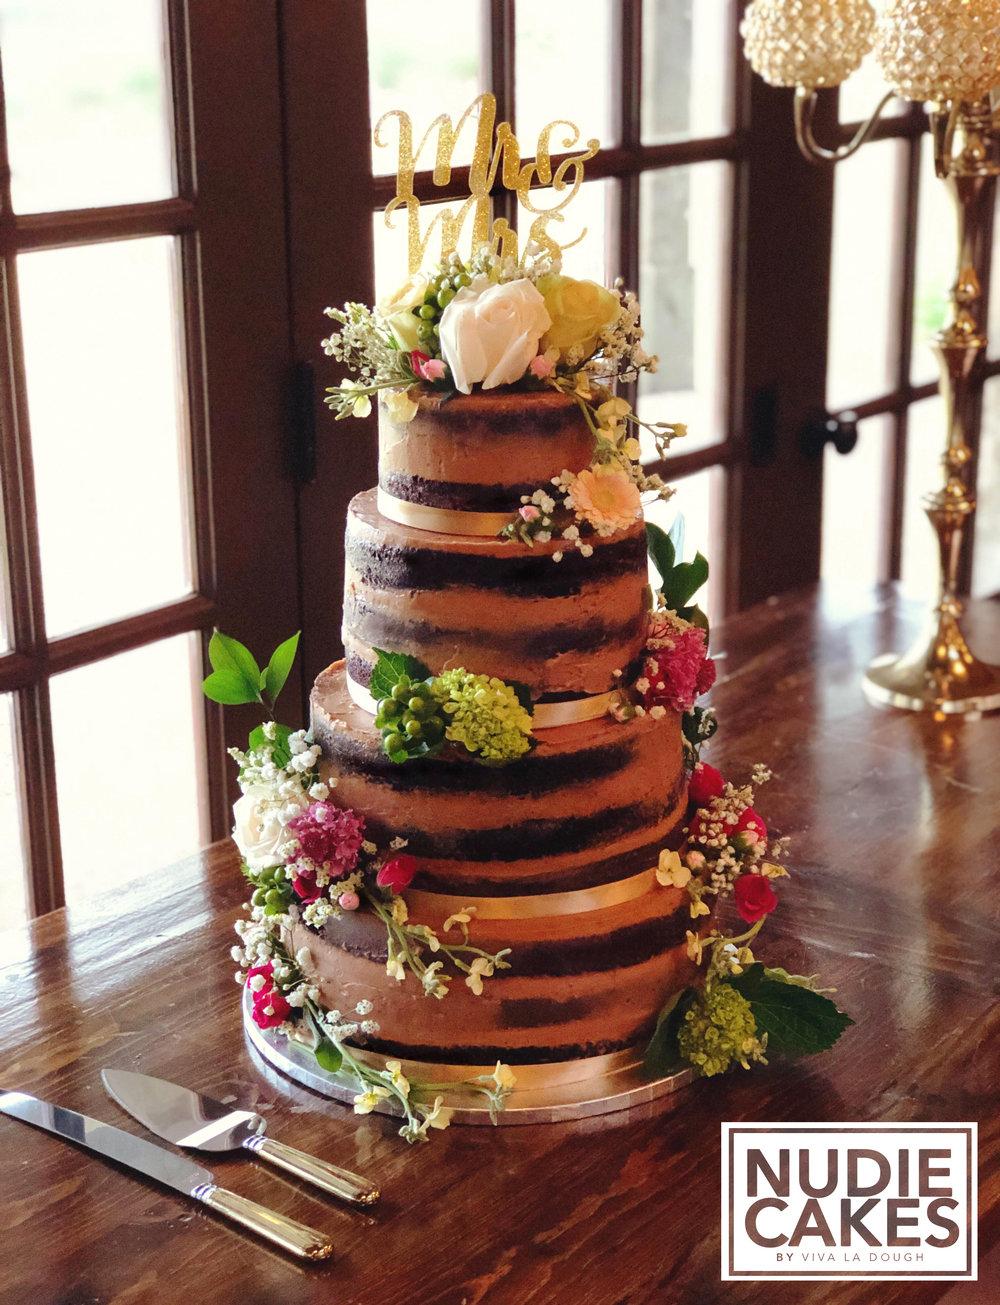 NUDIE CAKES by VIVA LA DOUGH